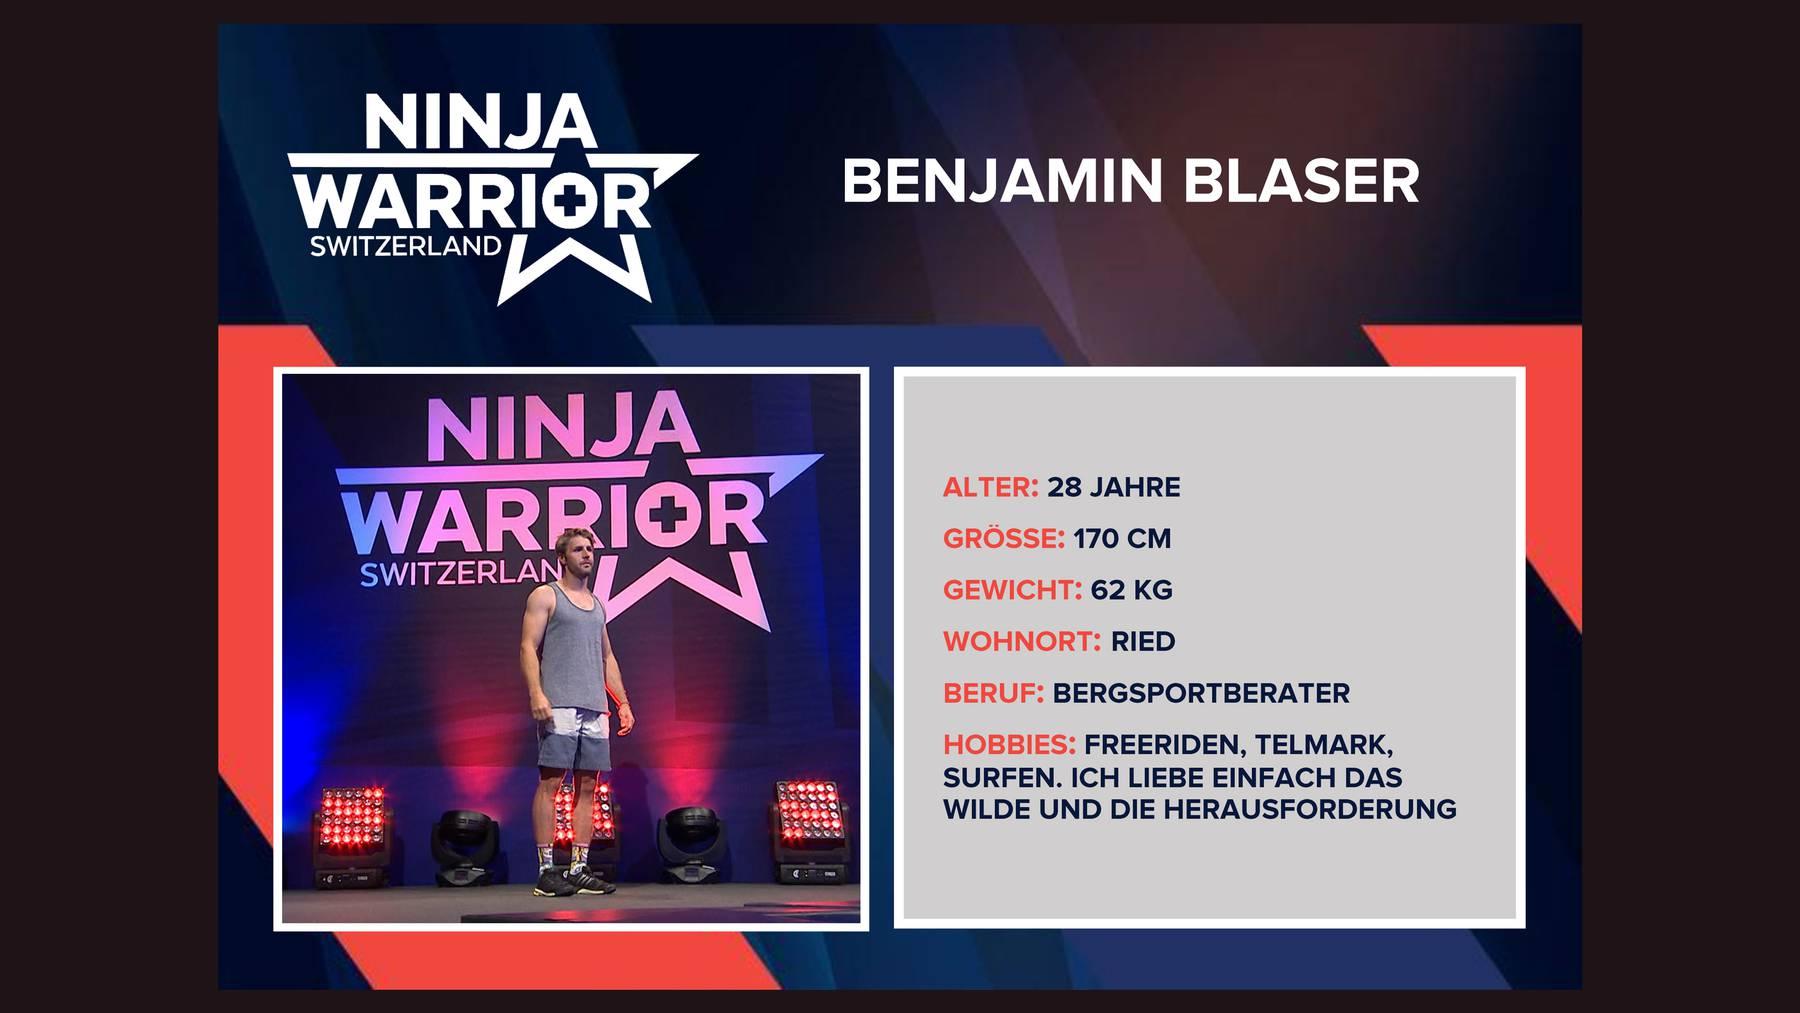 Benjamin Blaser